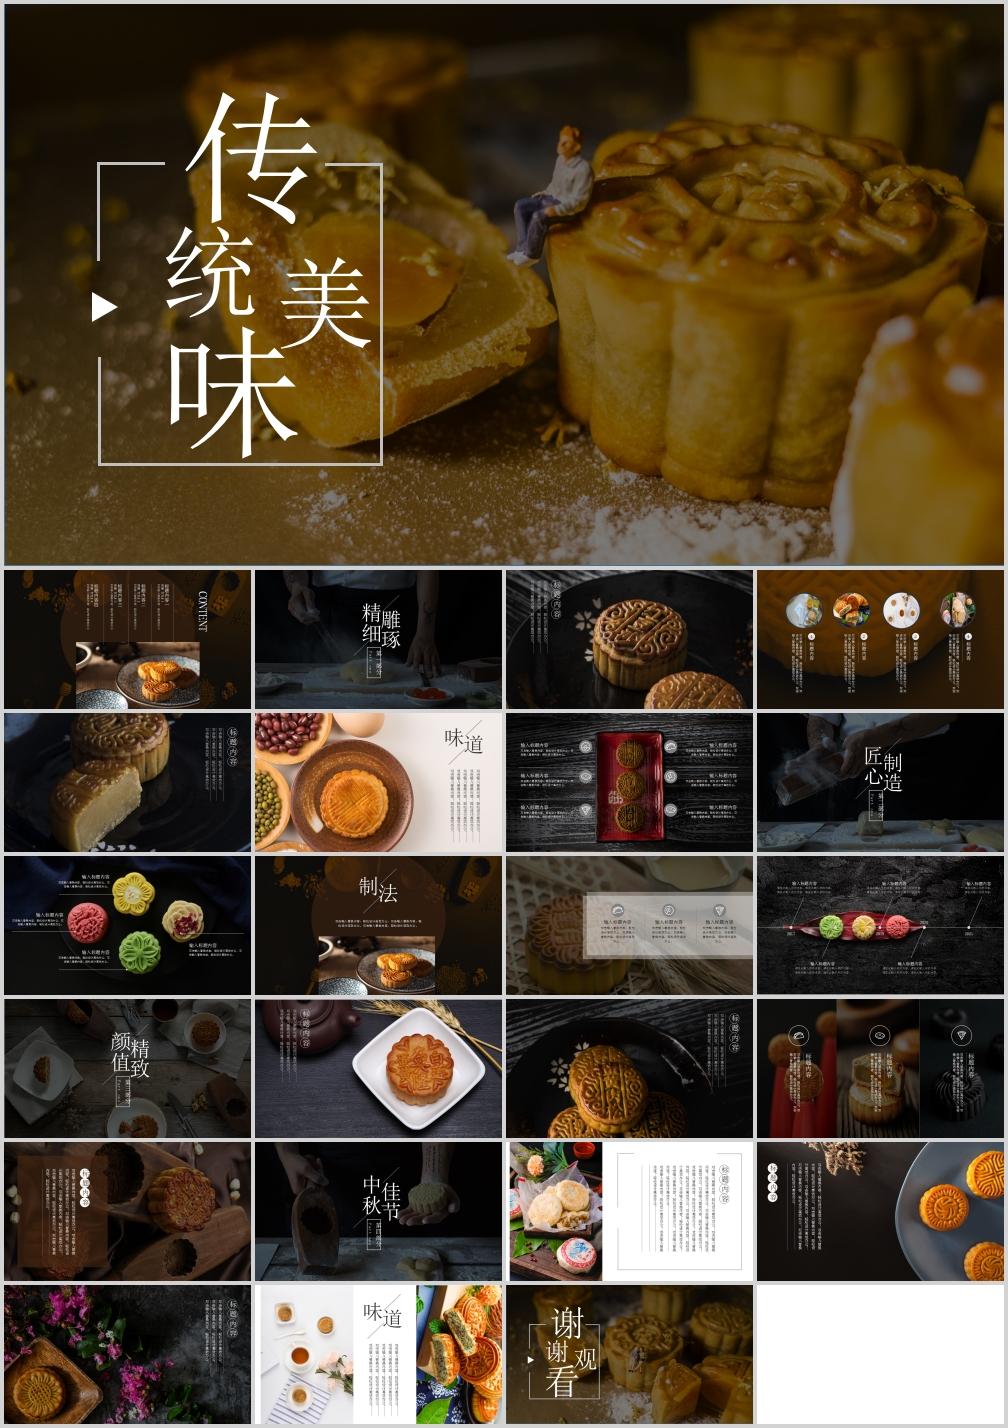 【PPT】国潮传统美食月饼中国风PPT模板-爱资源分享